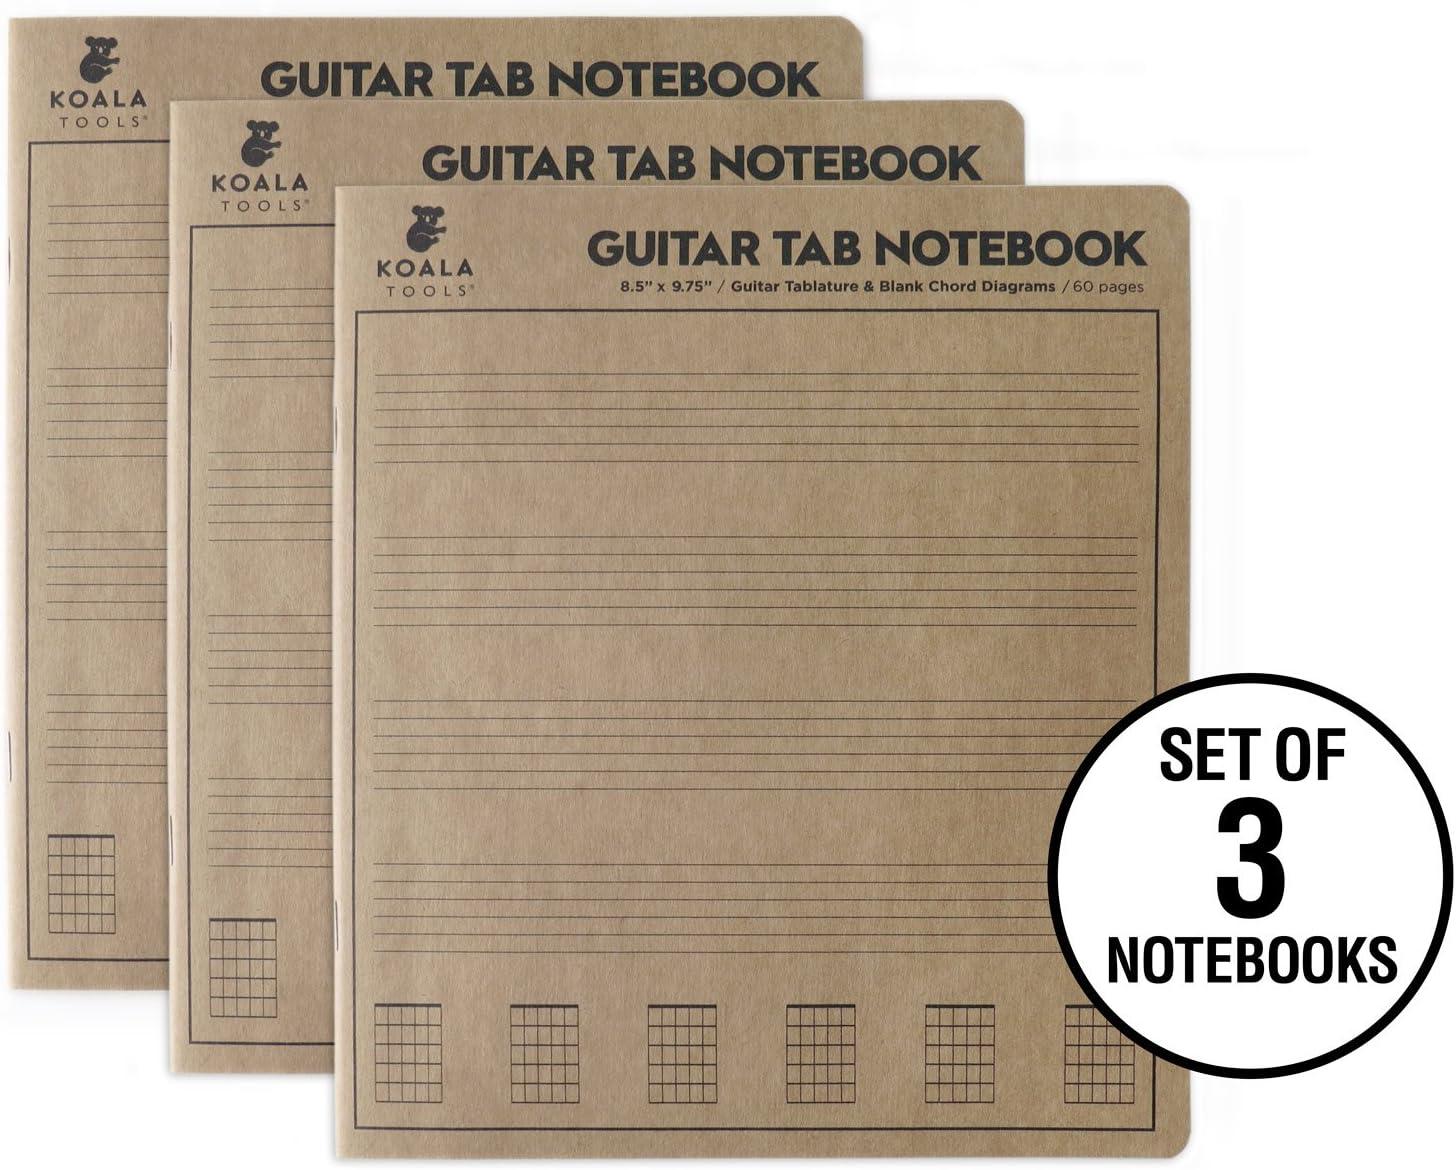 Koala herramientas | guitarra Tab portátil (Pack de 3): Amazon.es ...